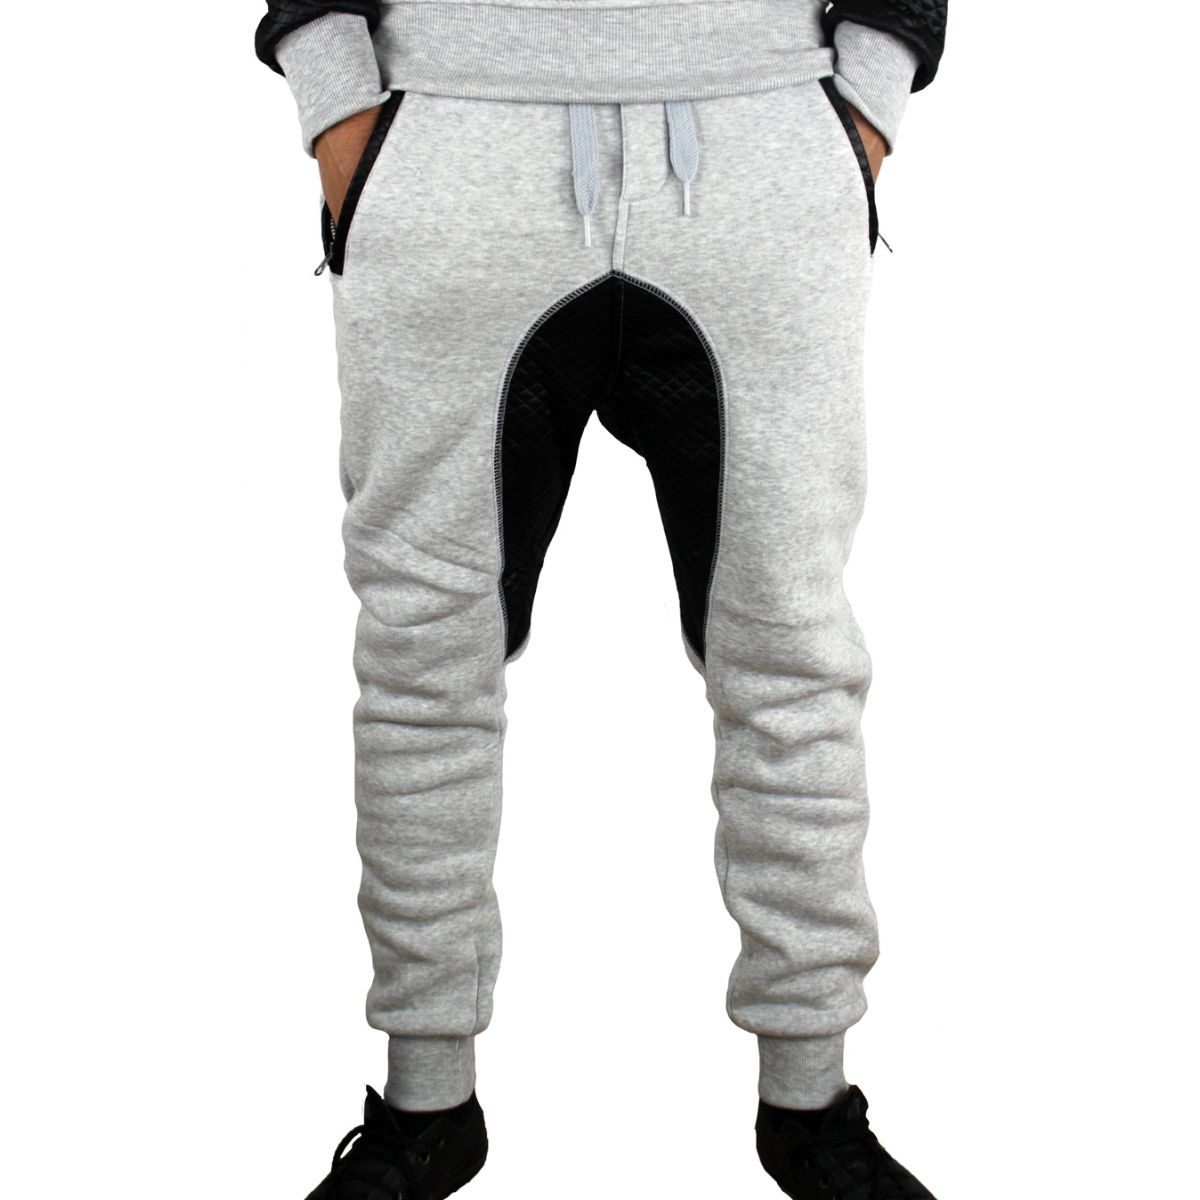 Sarouel homme en molleton gris